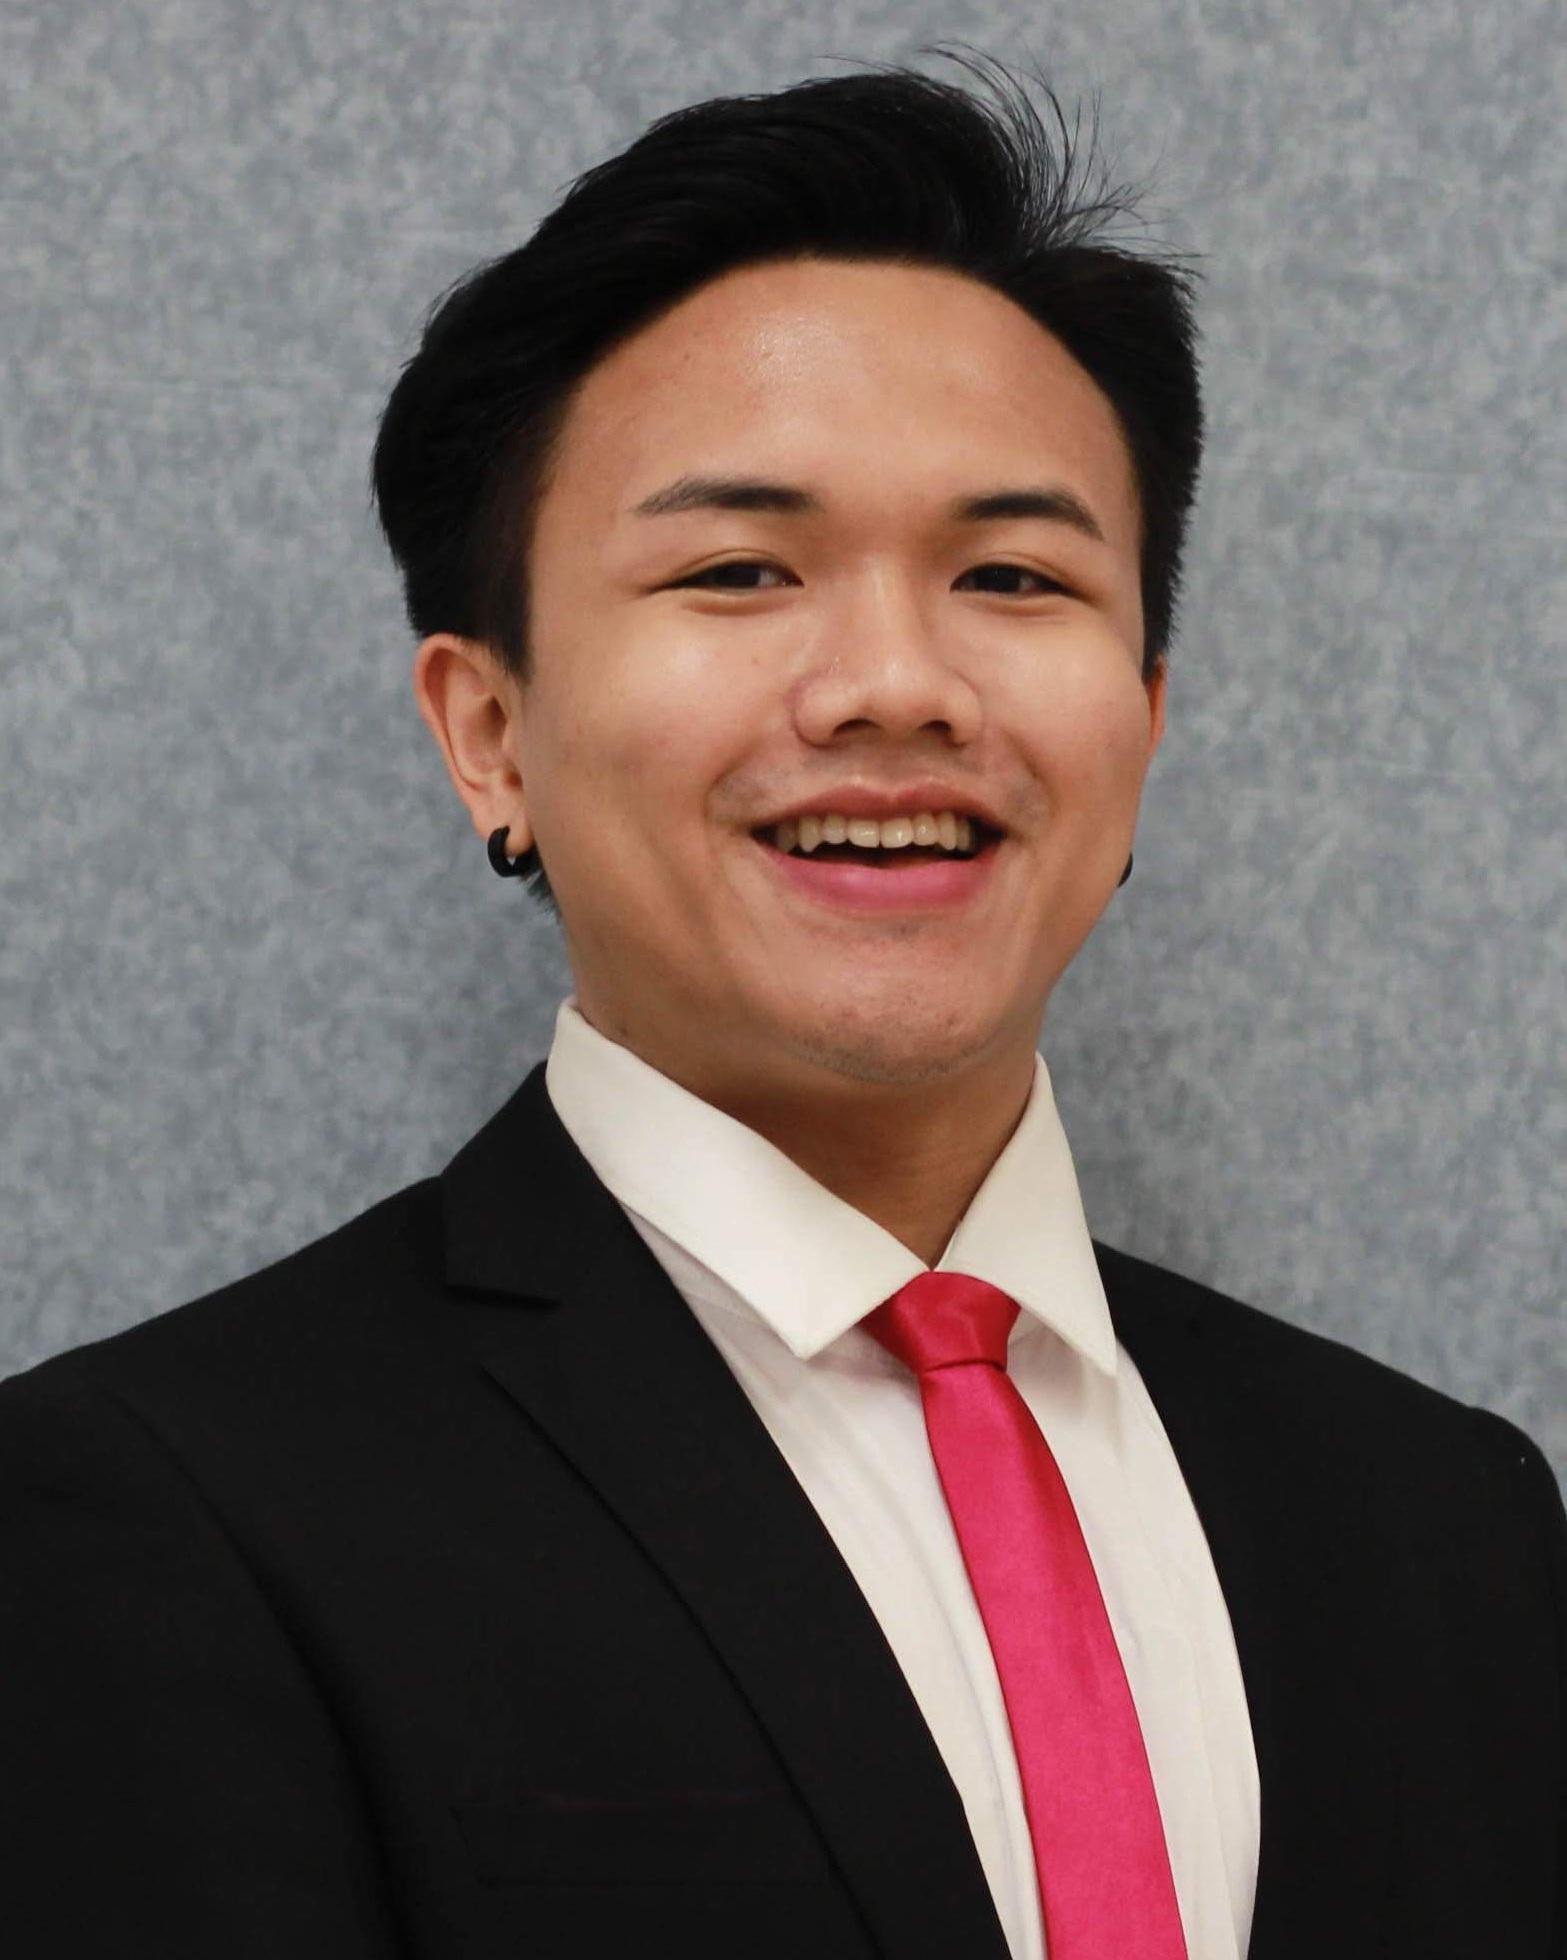 Saint Yoojaroen - Corresponding Secretary